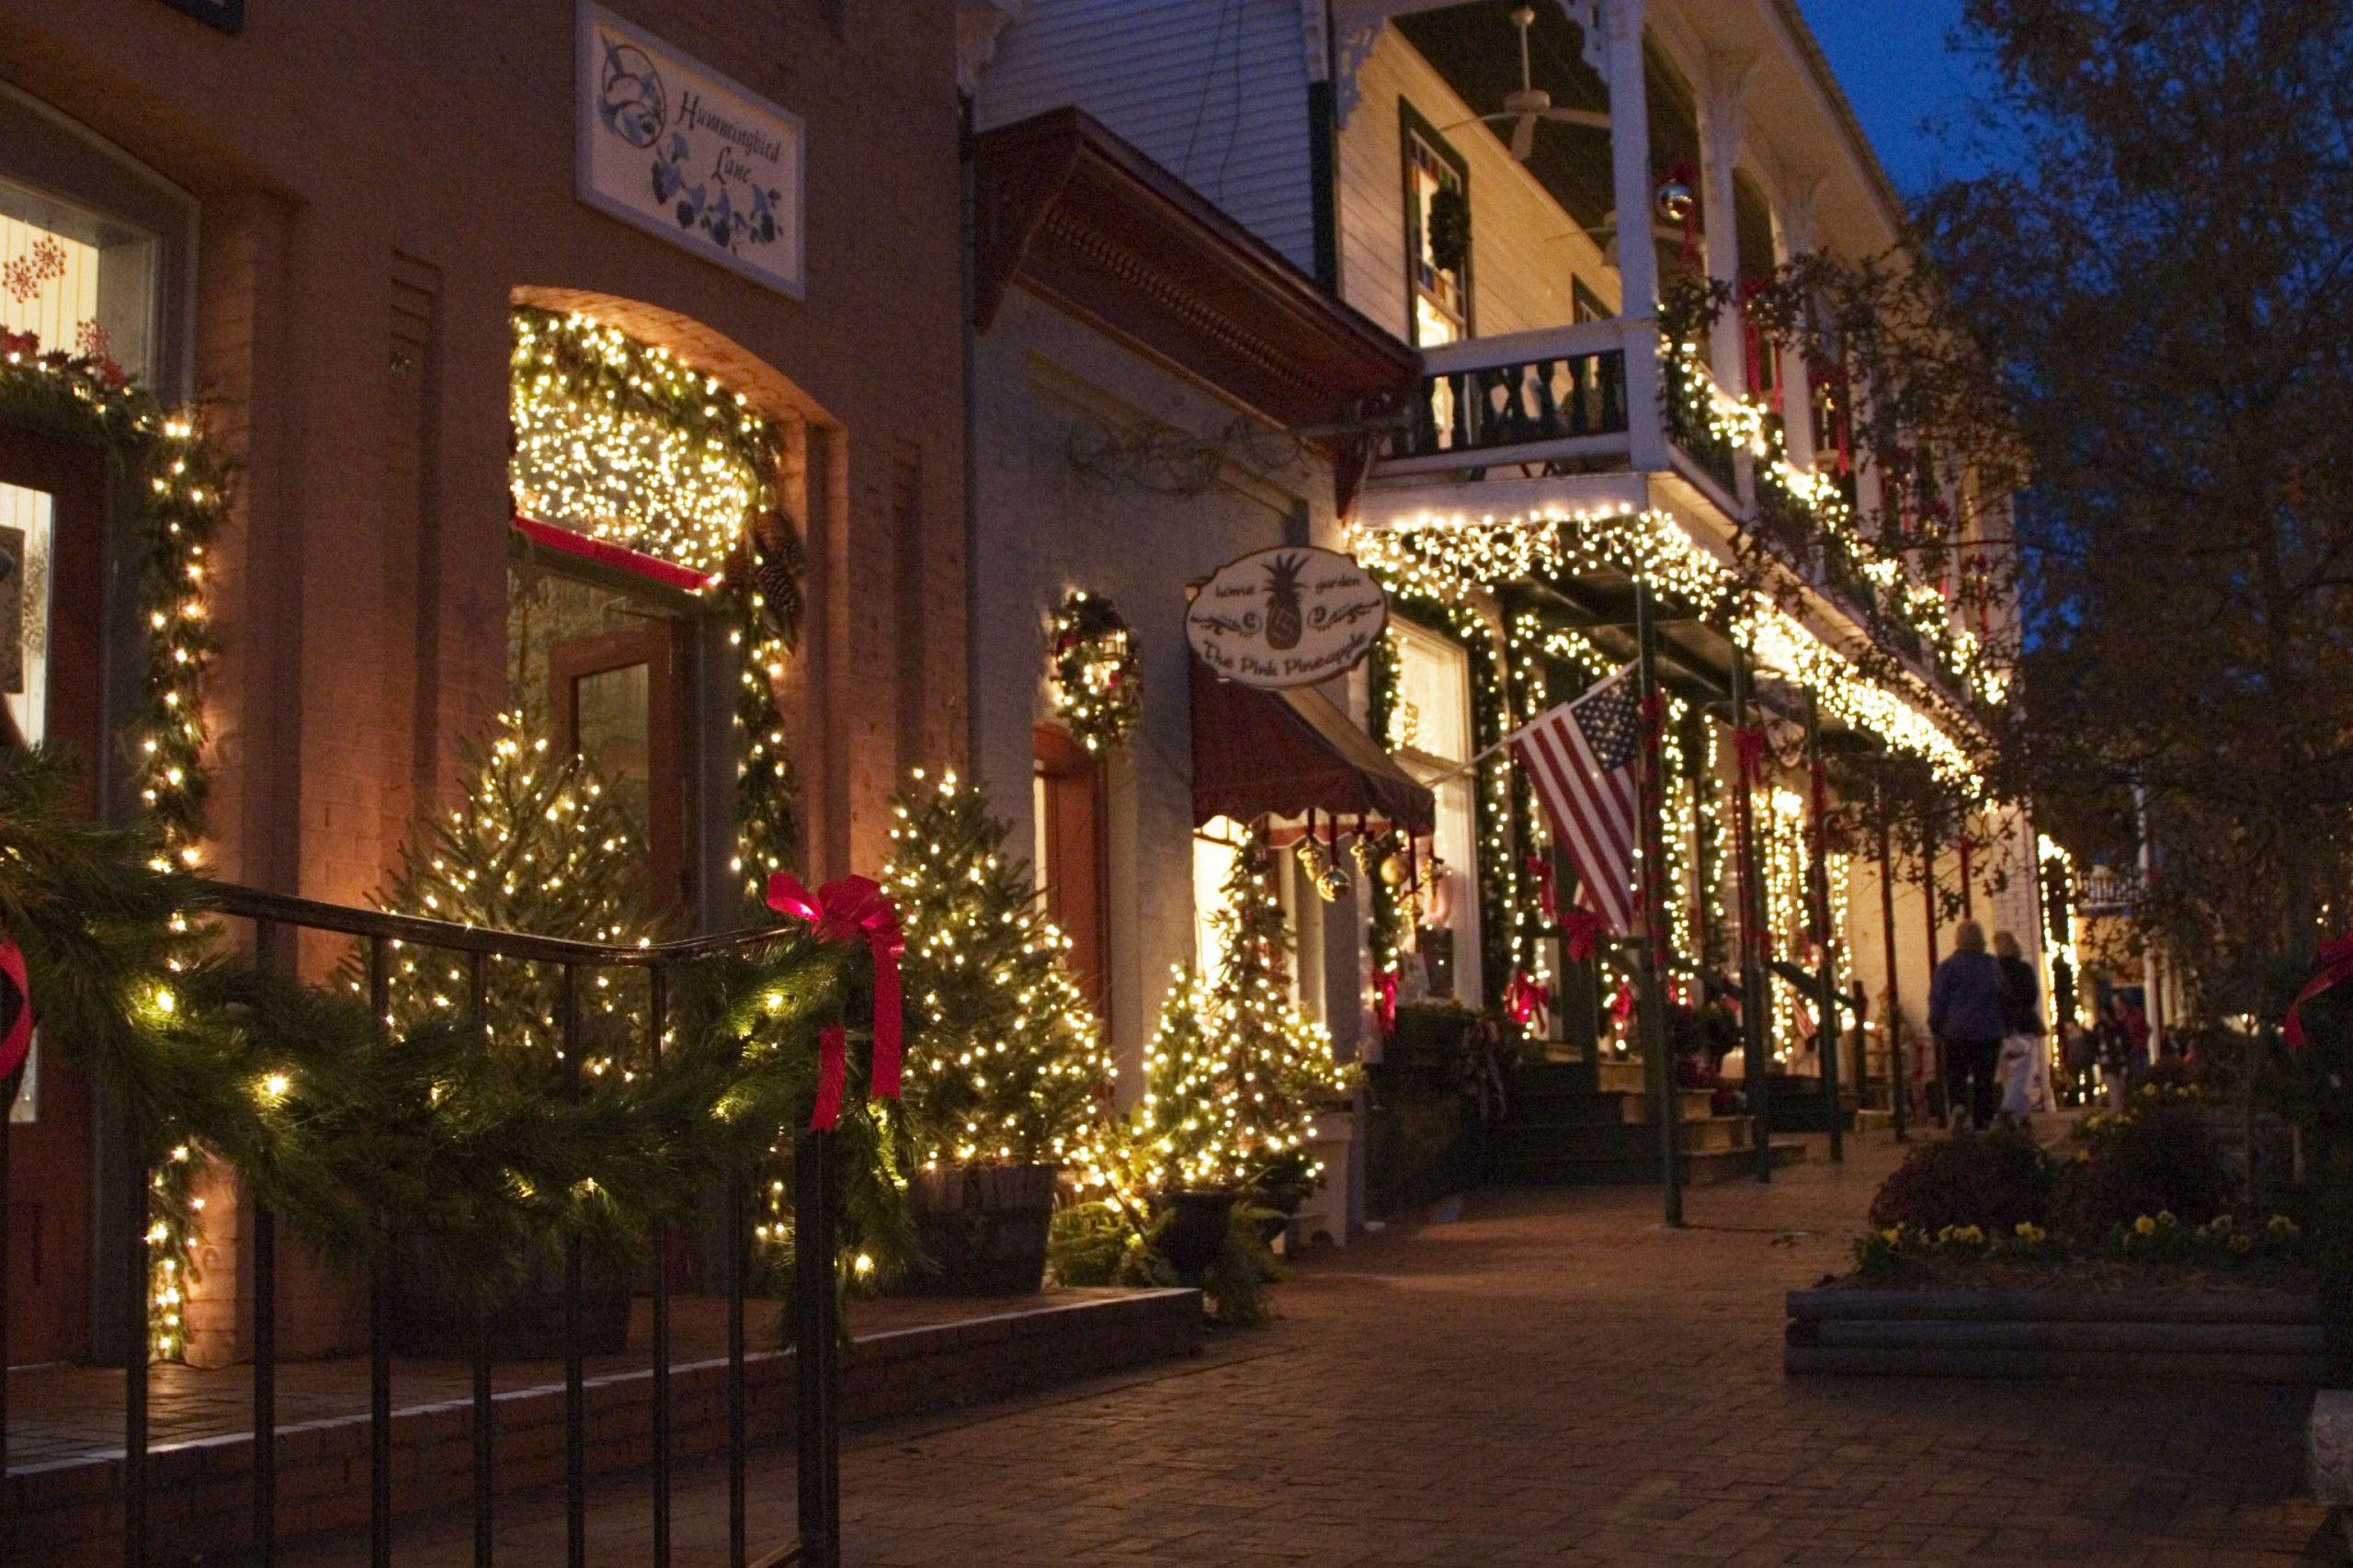 Dahlonega Ga Christmas.It S Christmas Time In Dahlonega Holidays In 2019 Old